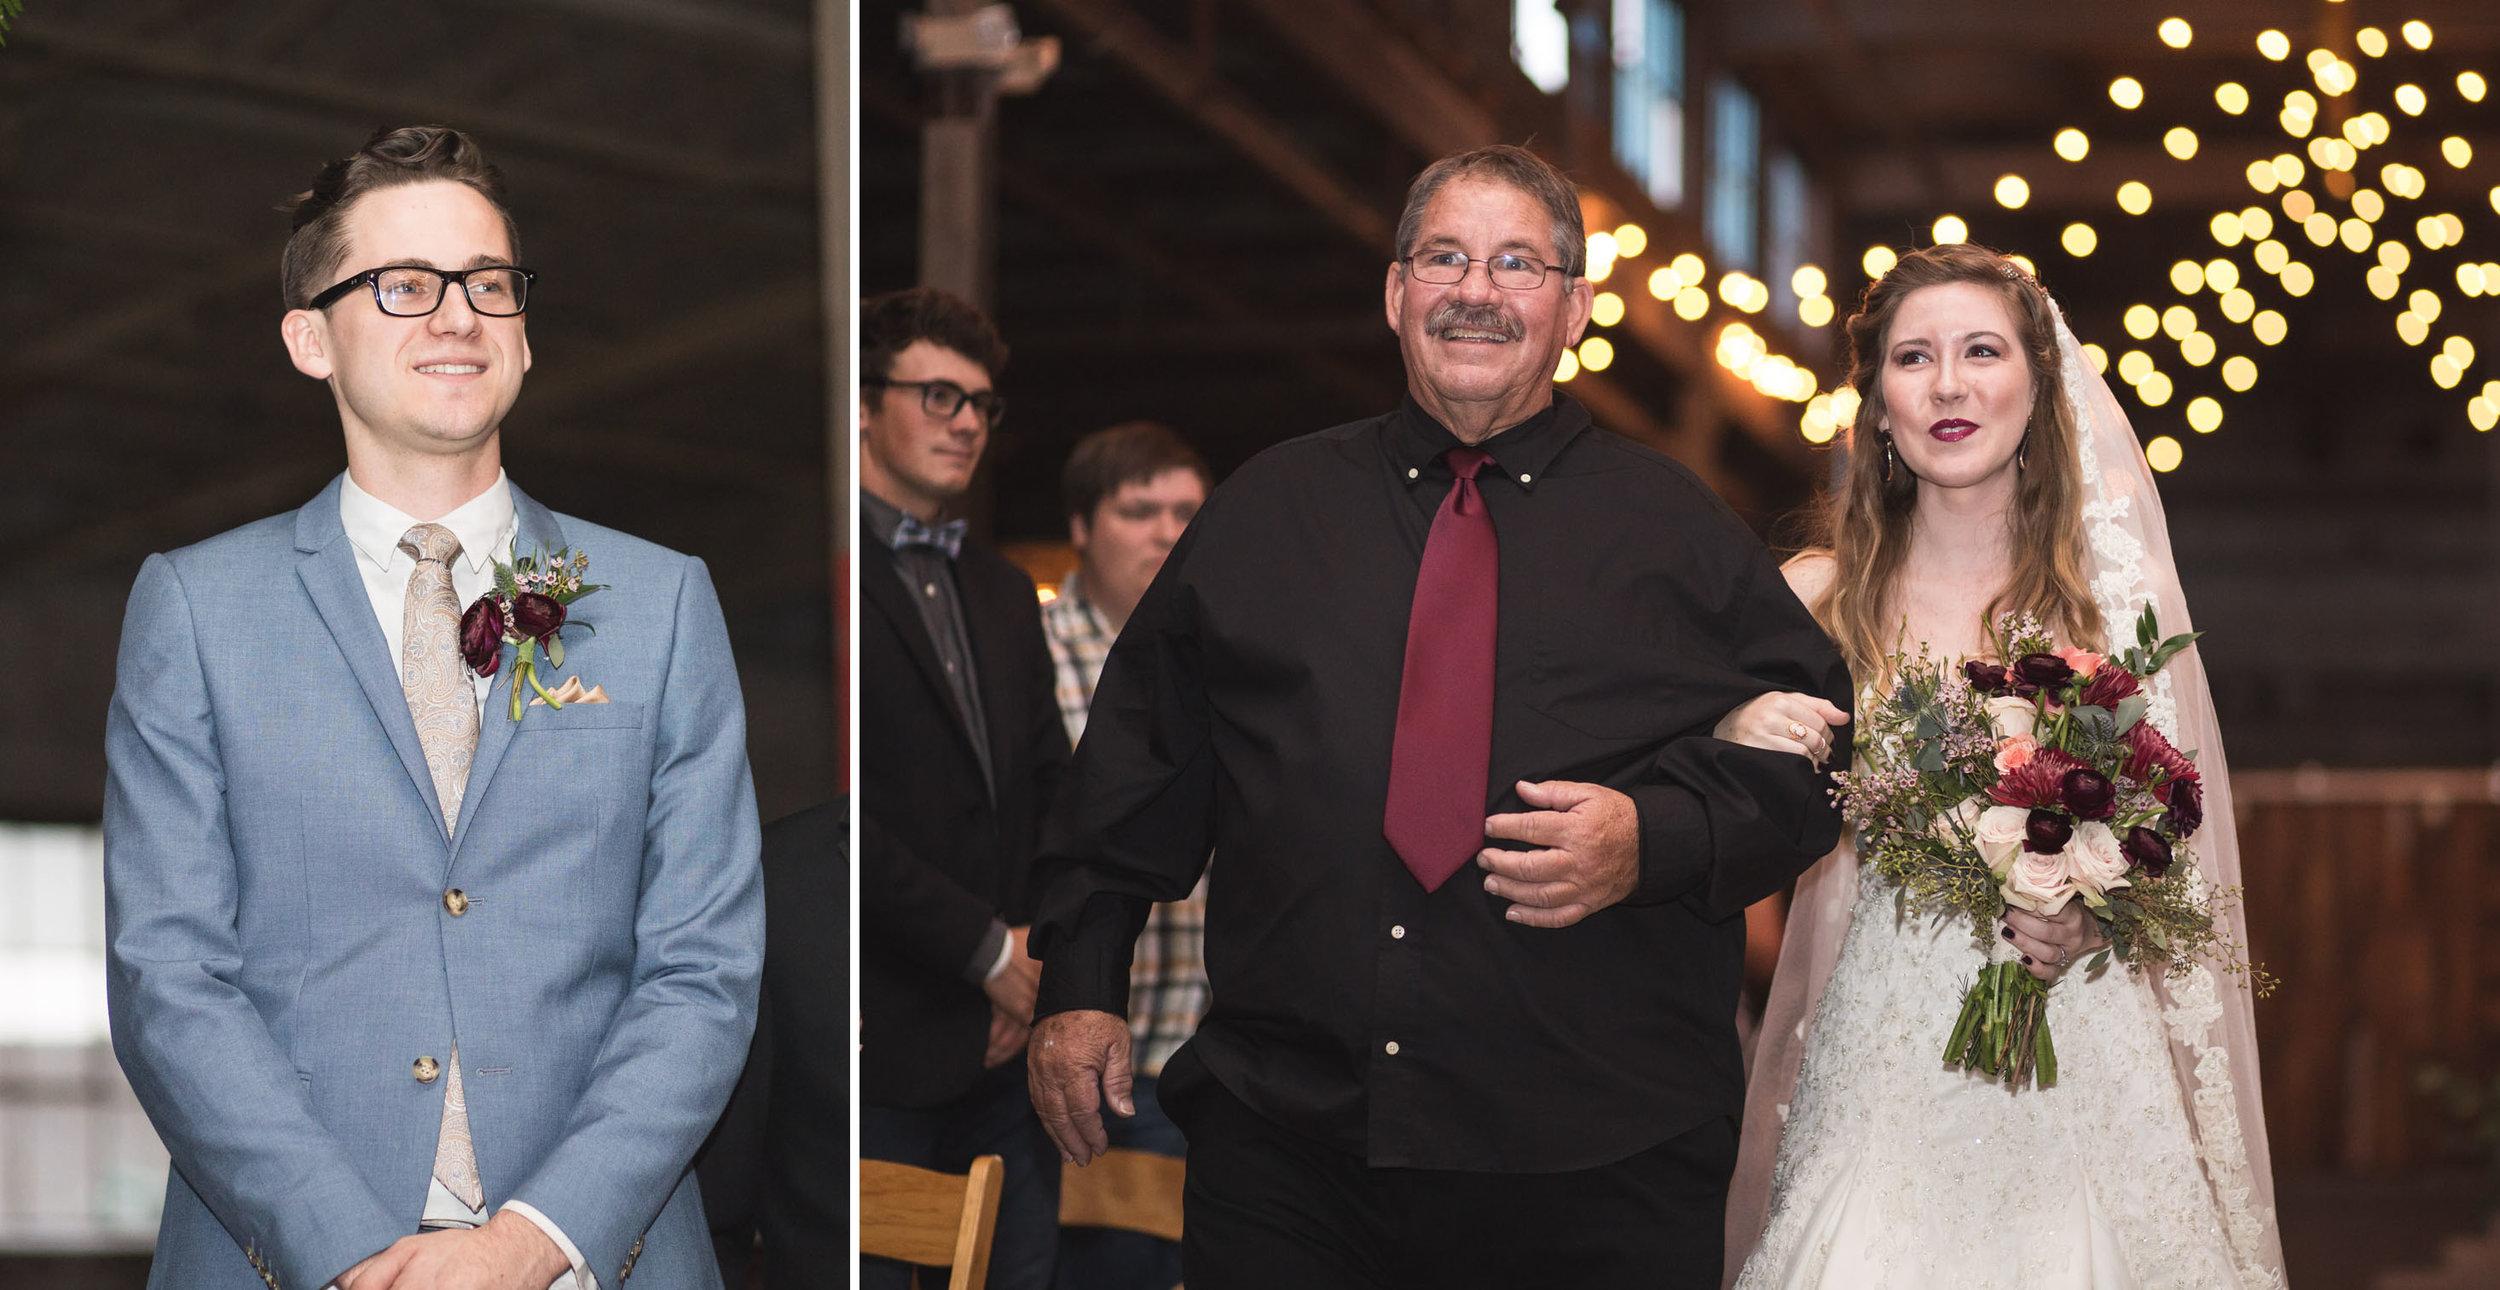 Adam-Szrmack-The-Glass-Factory-Wedding-104.jpg